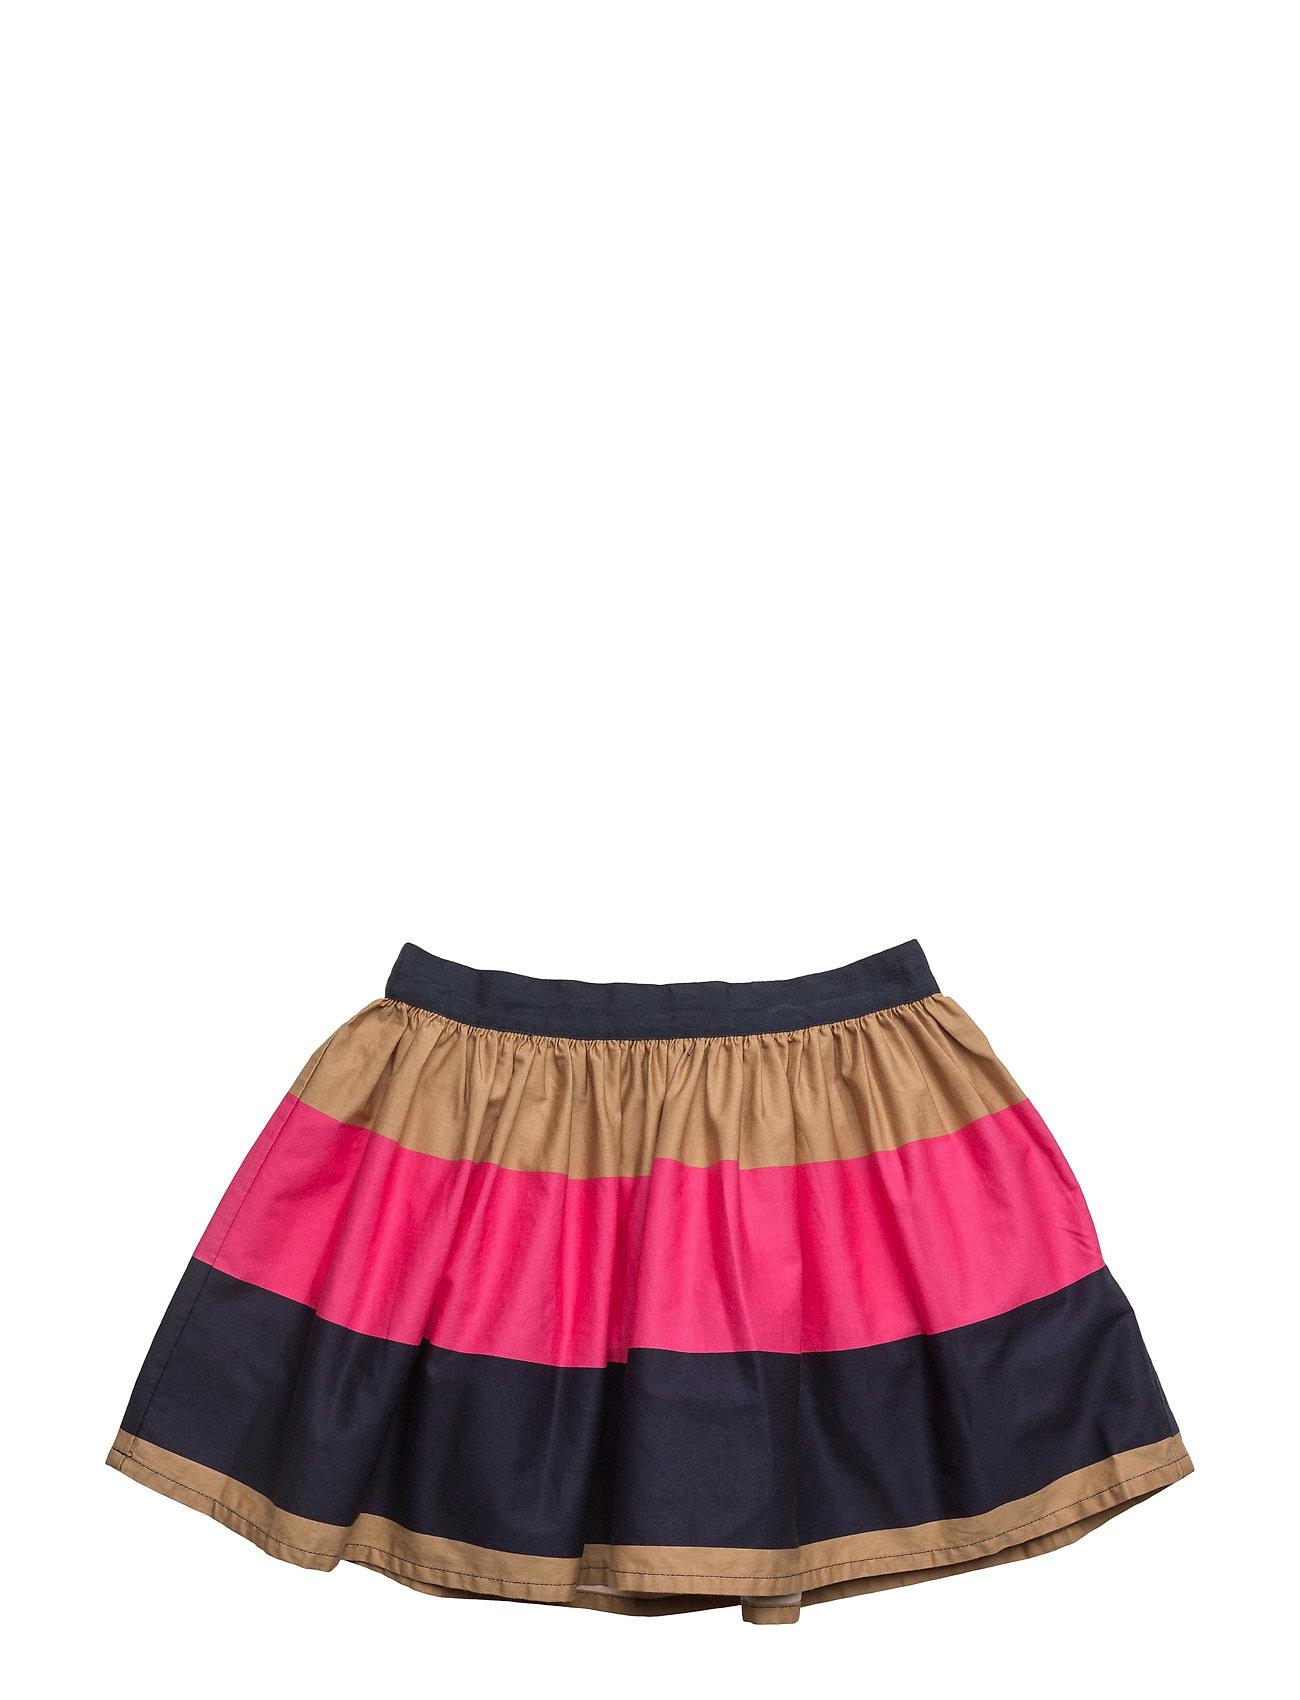 Skirt United Colors of Benetton Nederdele til Børn i